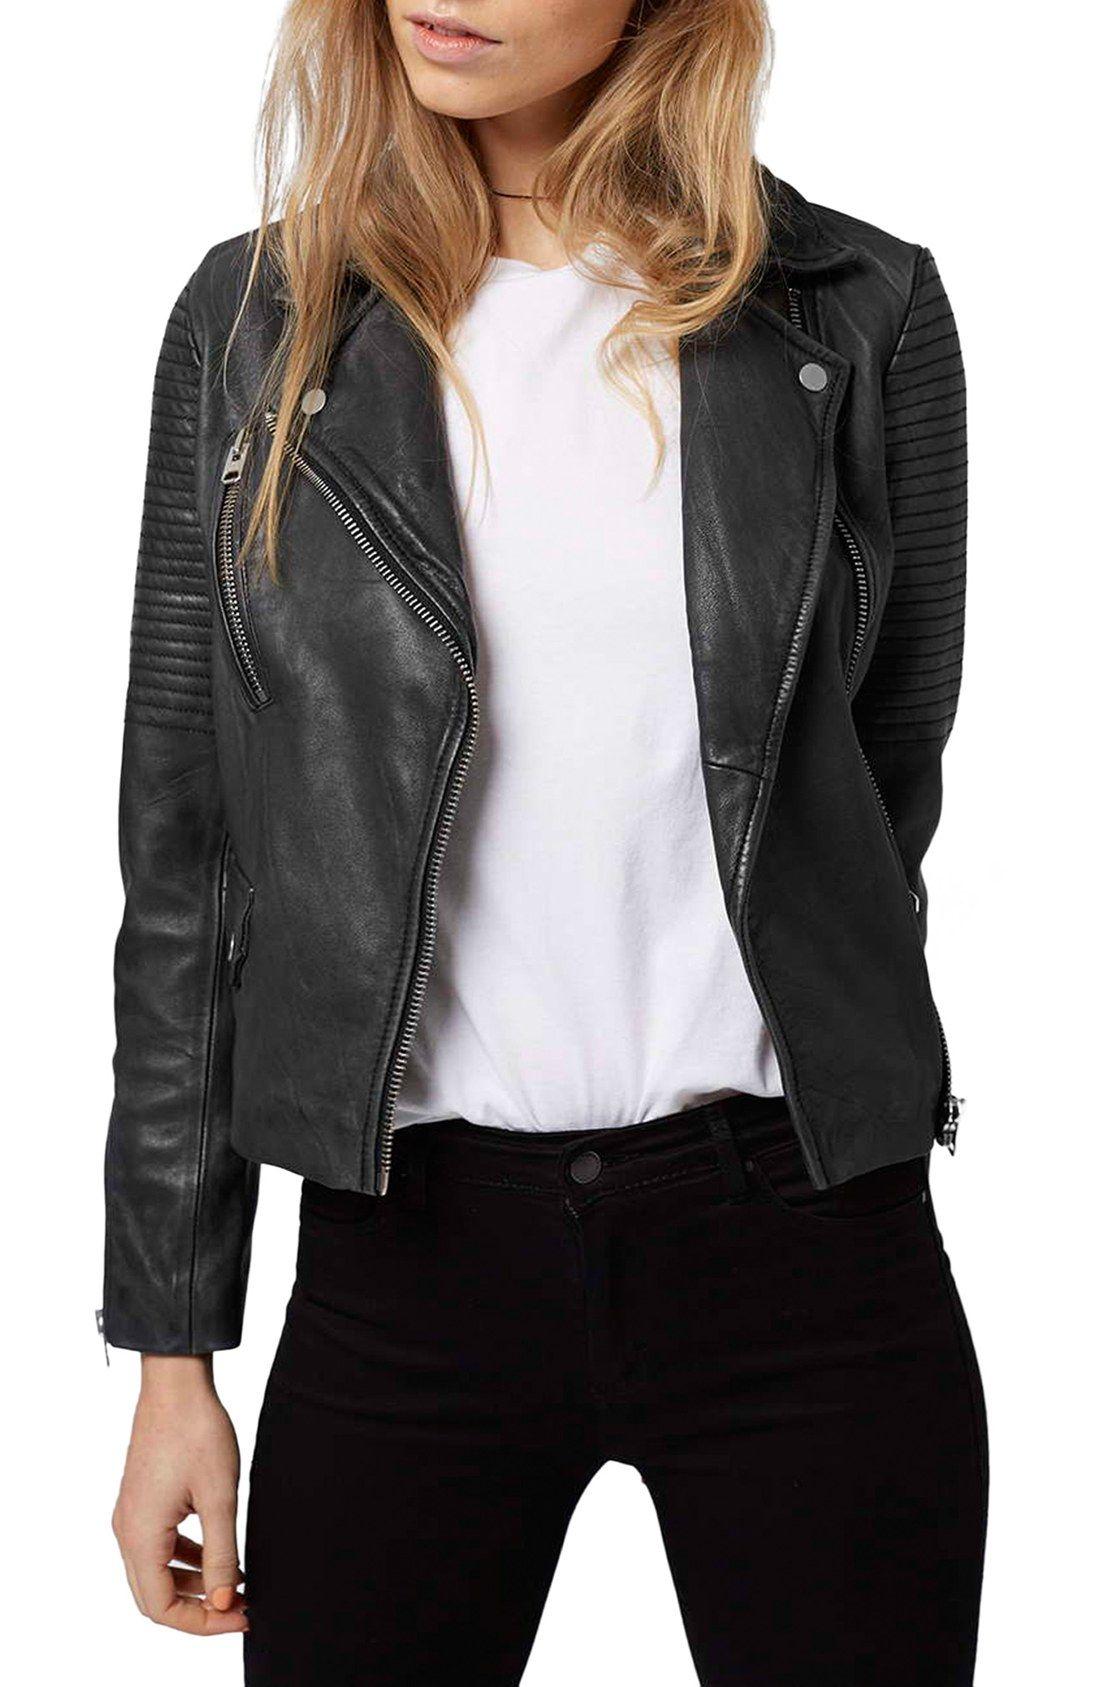 Topshop 'Orbit' Leather Moto Jacket | Nordstrom | Fashion ...